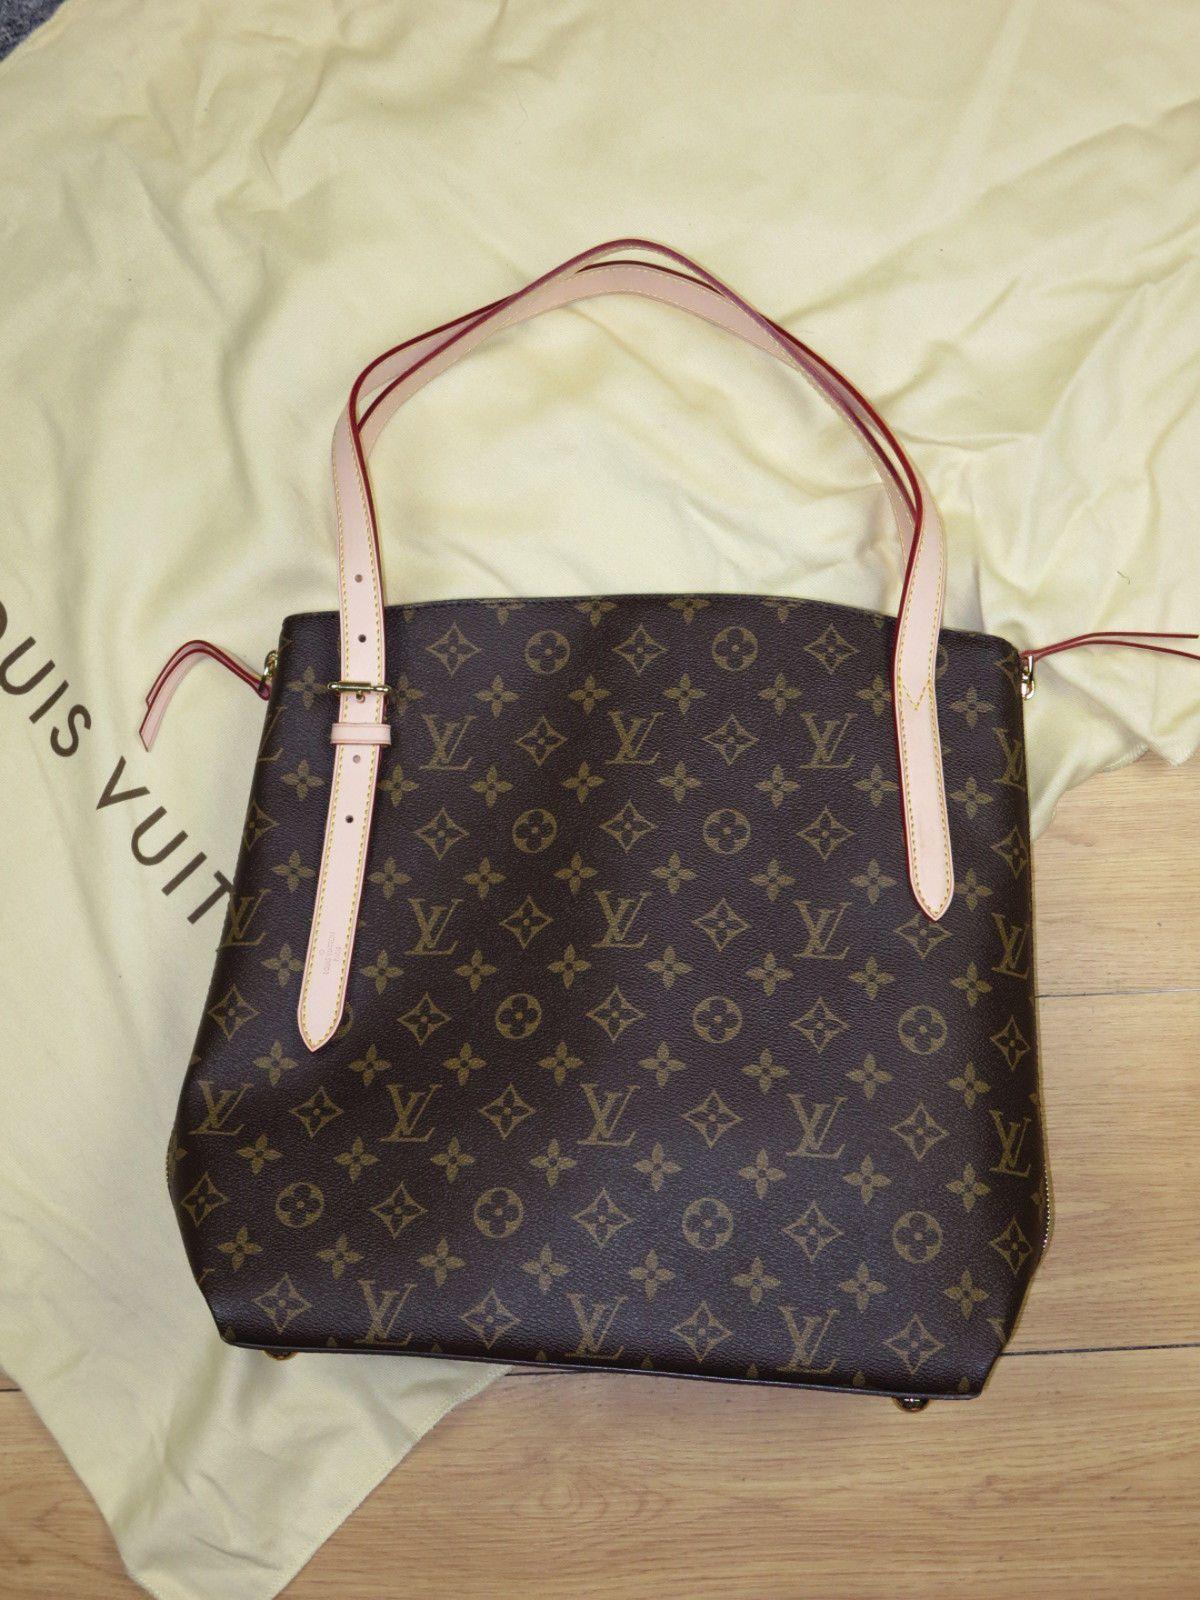 b17b9a33577a Pre-owned   Used Louis Vuitton Handbag Neverfull Voltaire M41208 Monogram  Canvas  Louisvuittonhandbags